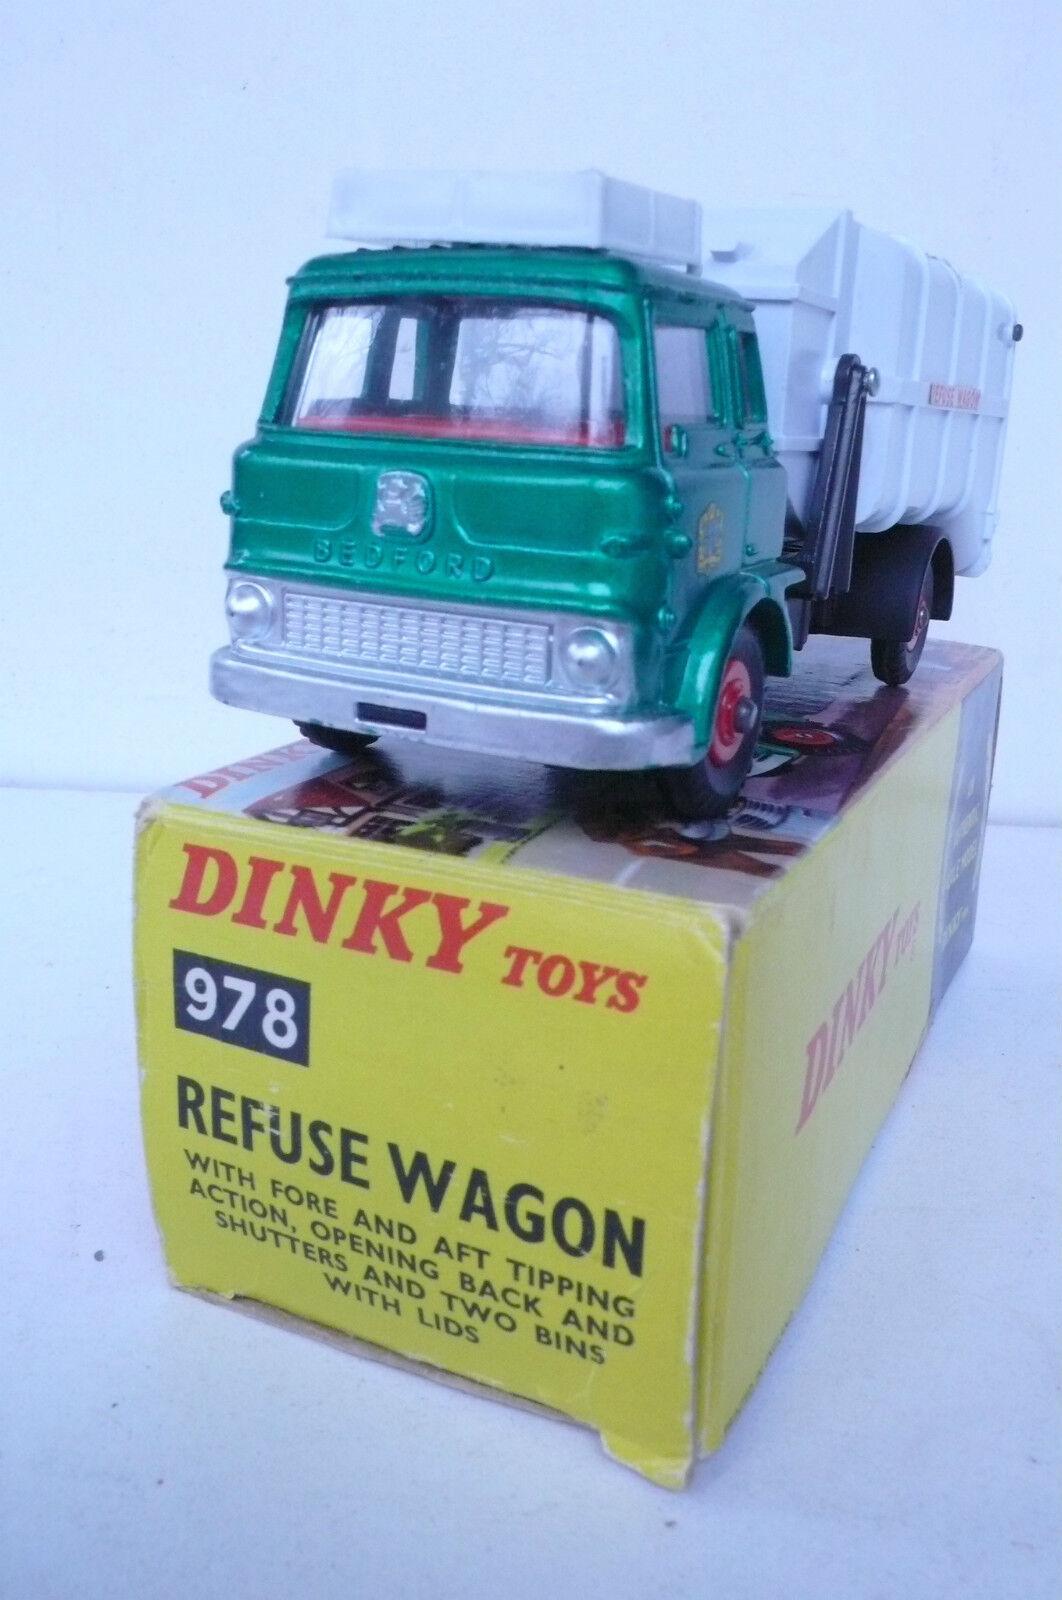 DINKY DINKY DINKY TOYS GB  BEDFORD REFUSE WAGON  REF 978  BOITE  D'ORIGINE  TRÈS BON ÉTAT   Magnifique    Shopping Online  12e17f